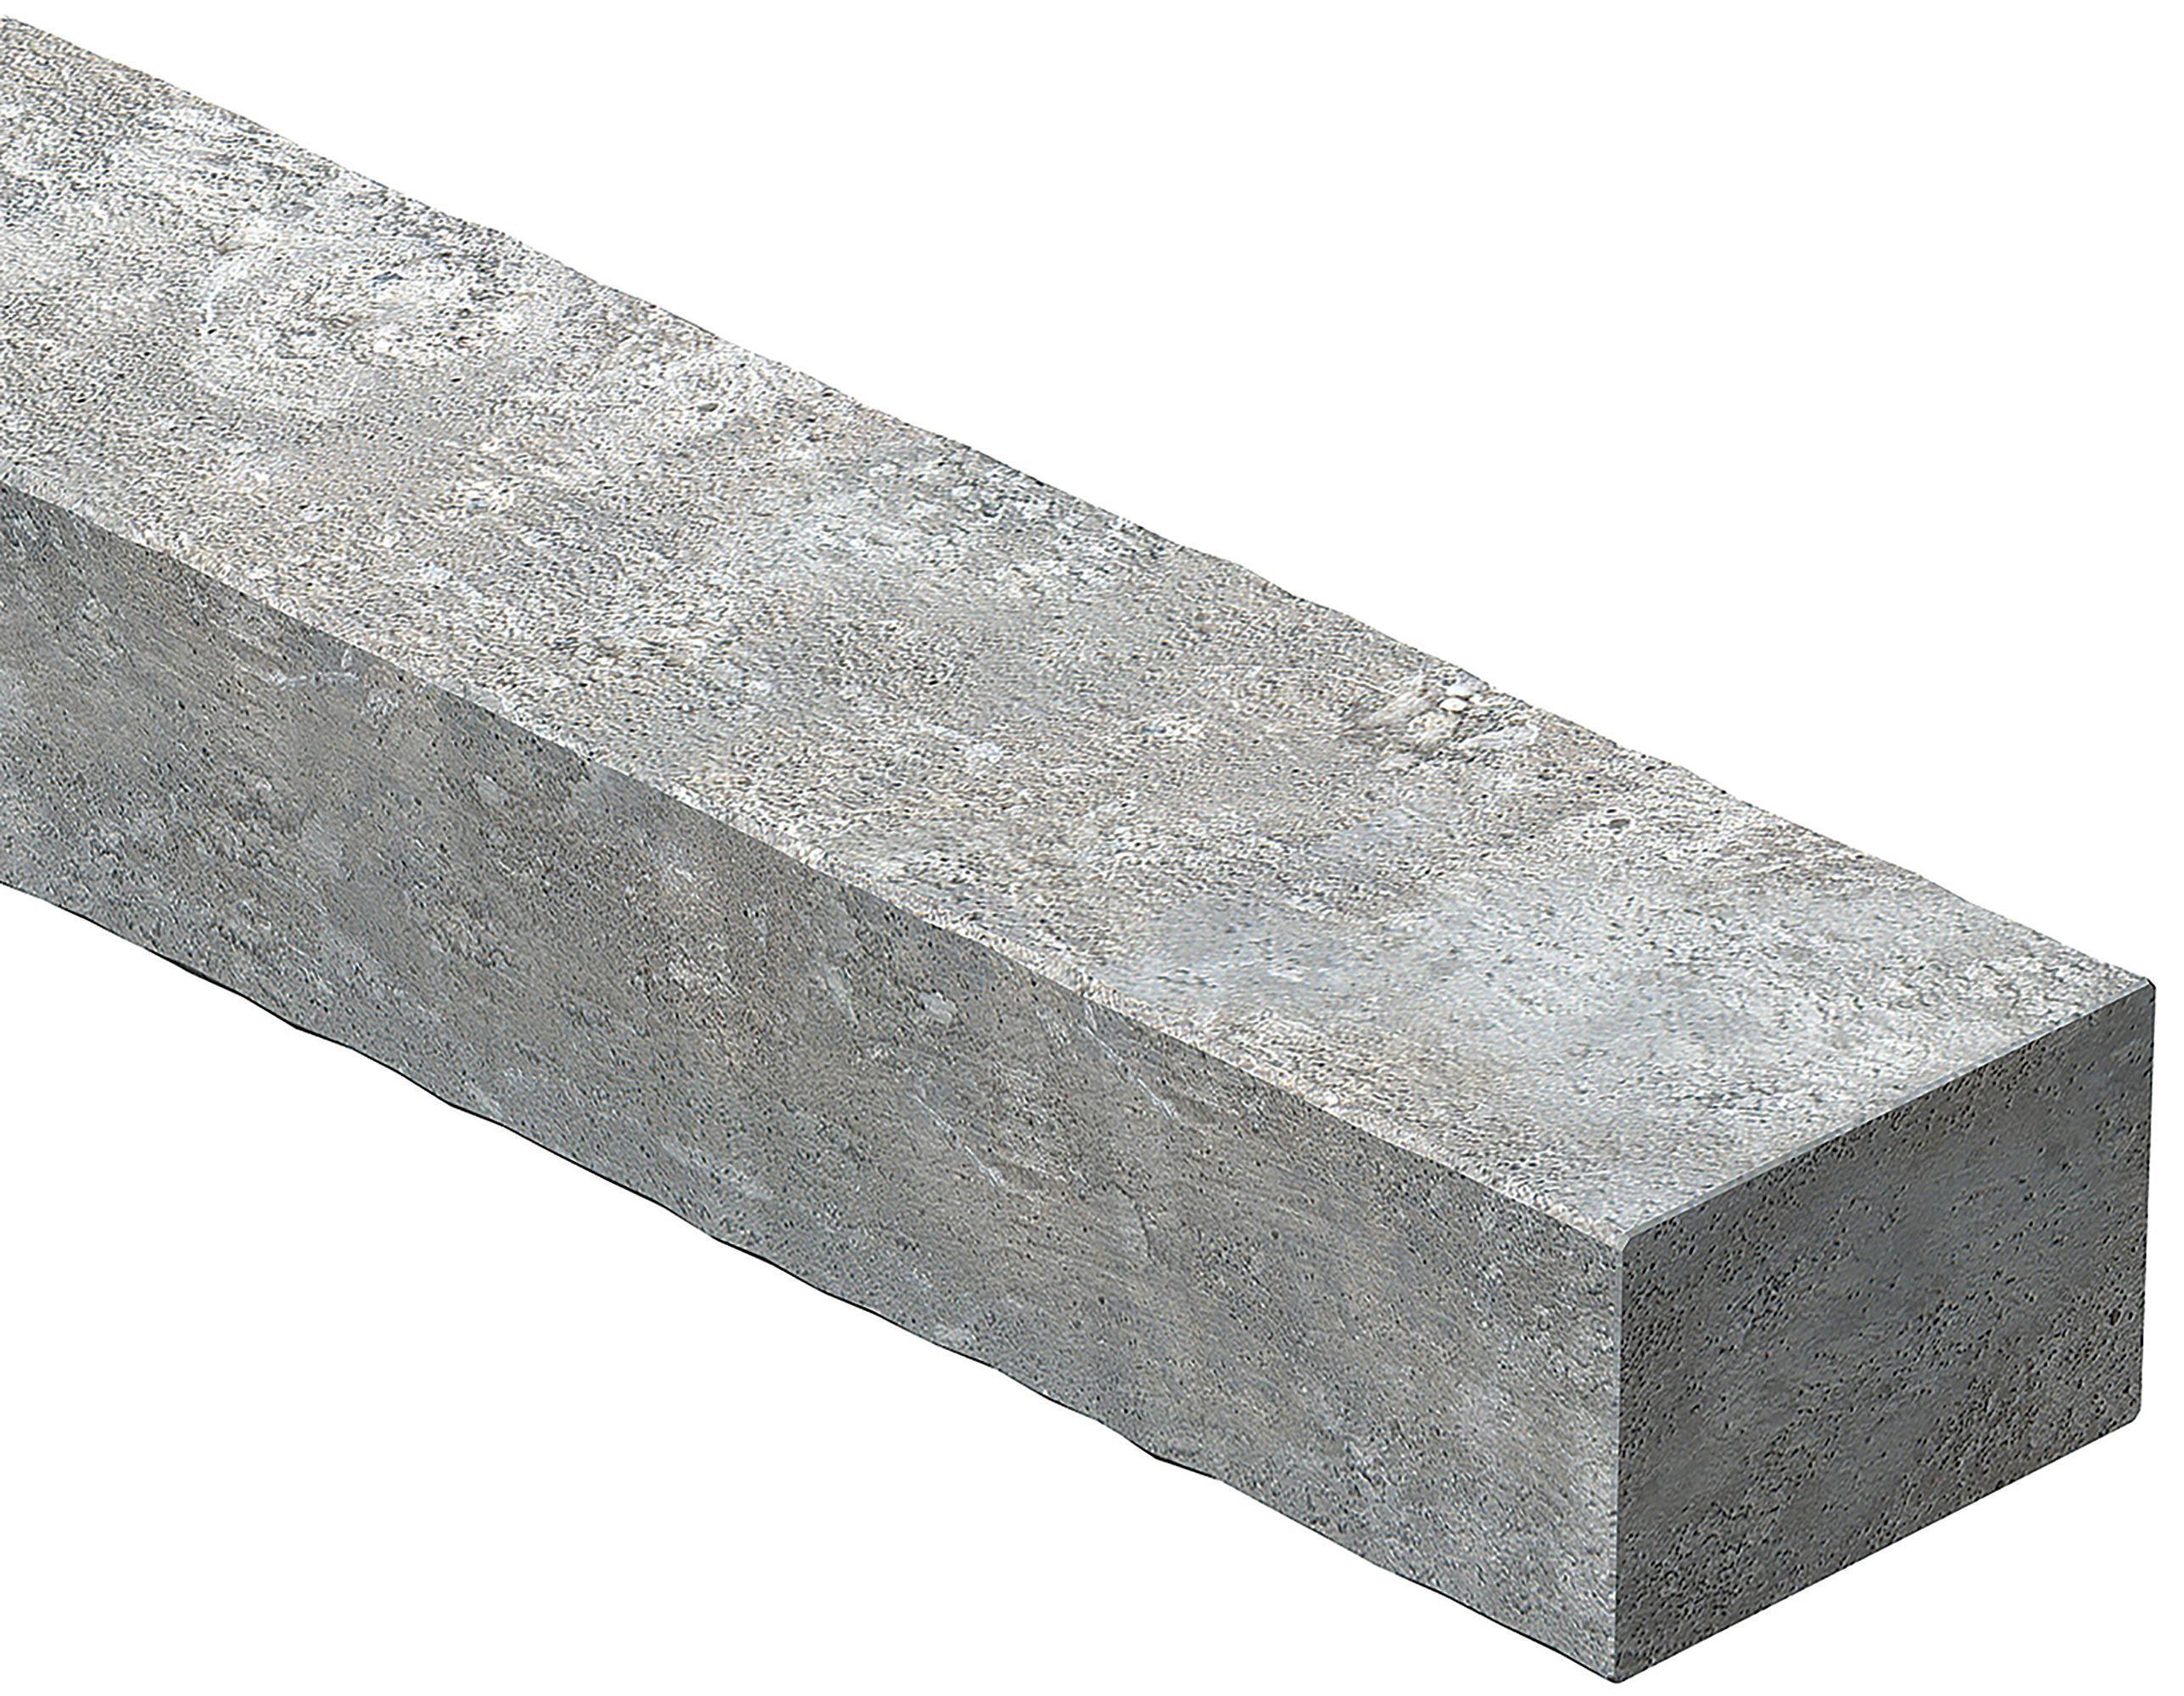 Expamet Pre Stressed Reinforced Concrete Lintel L 1050mm